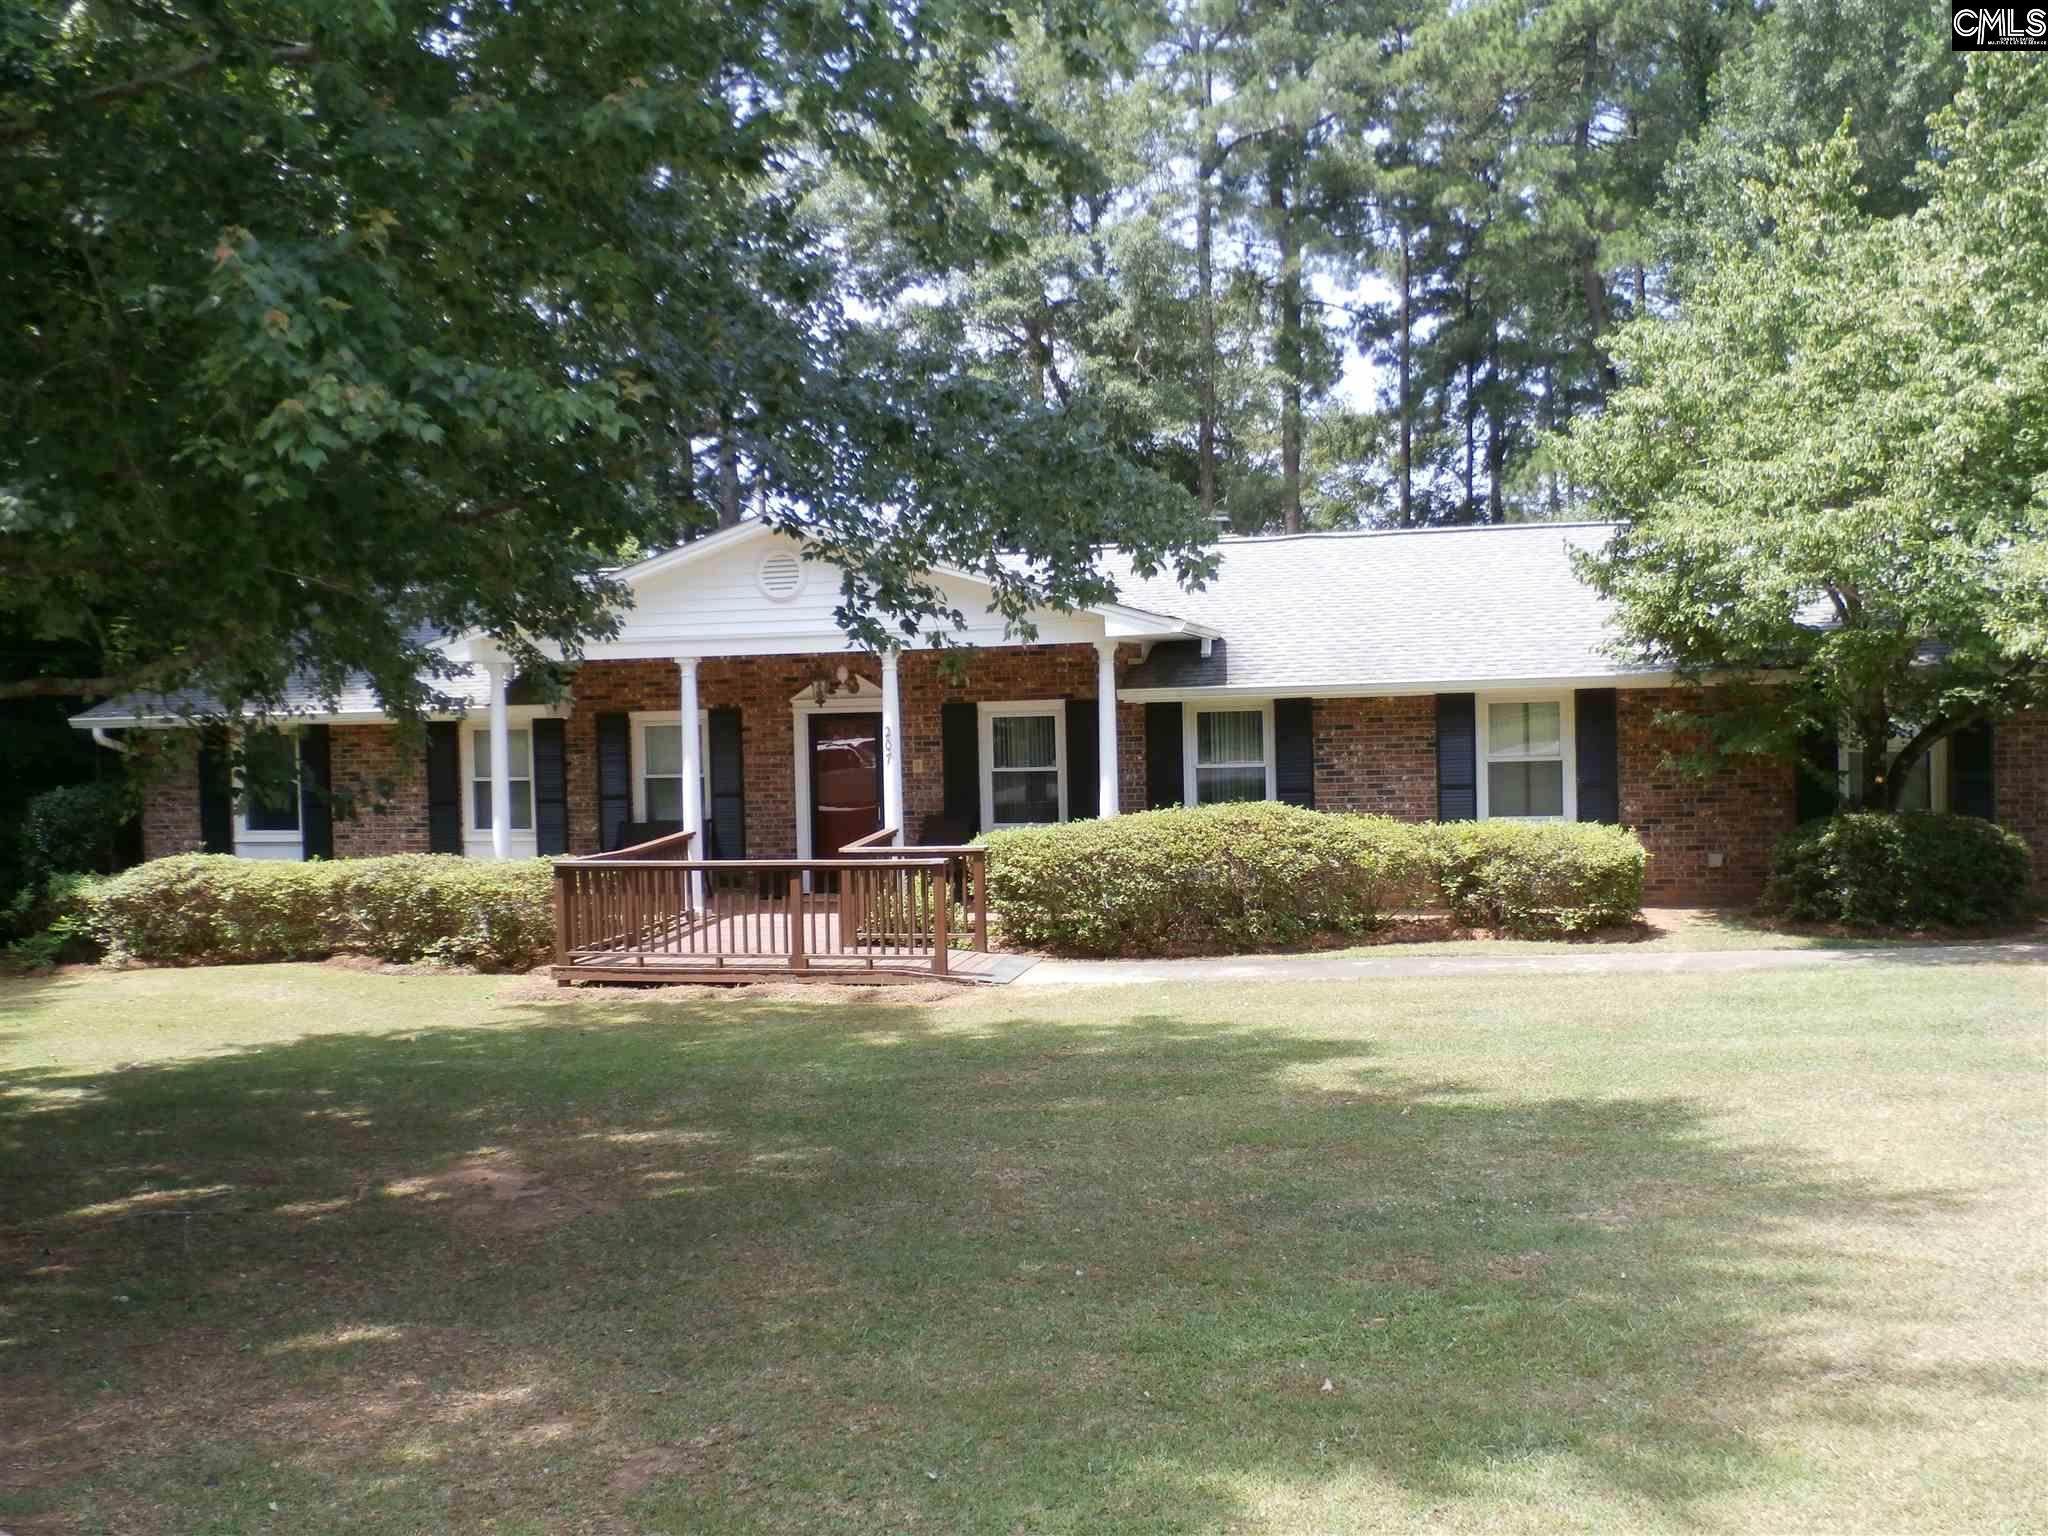 207 Marion Winnsboro, SC 29180